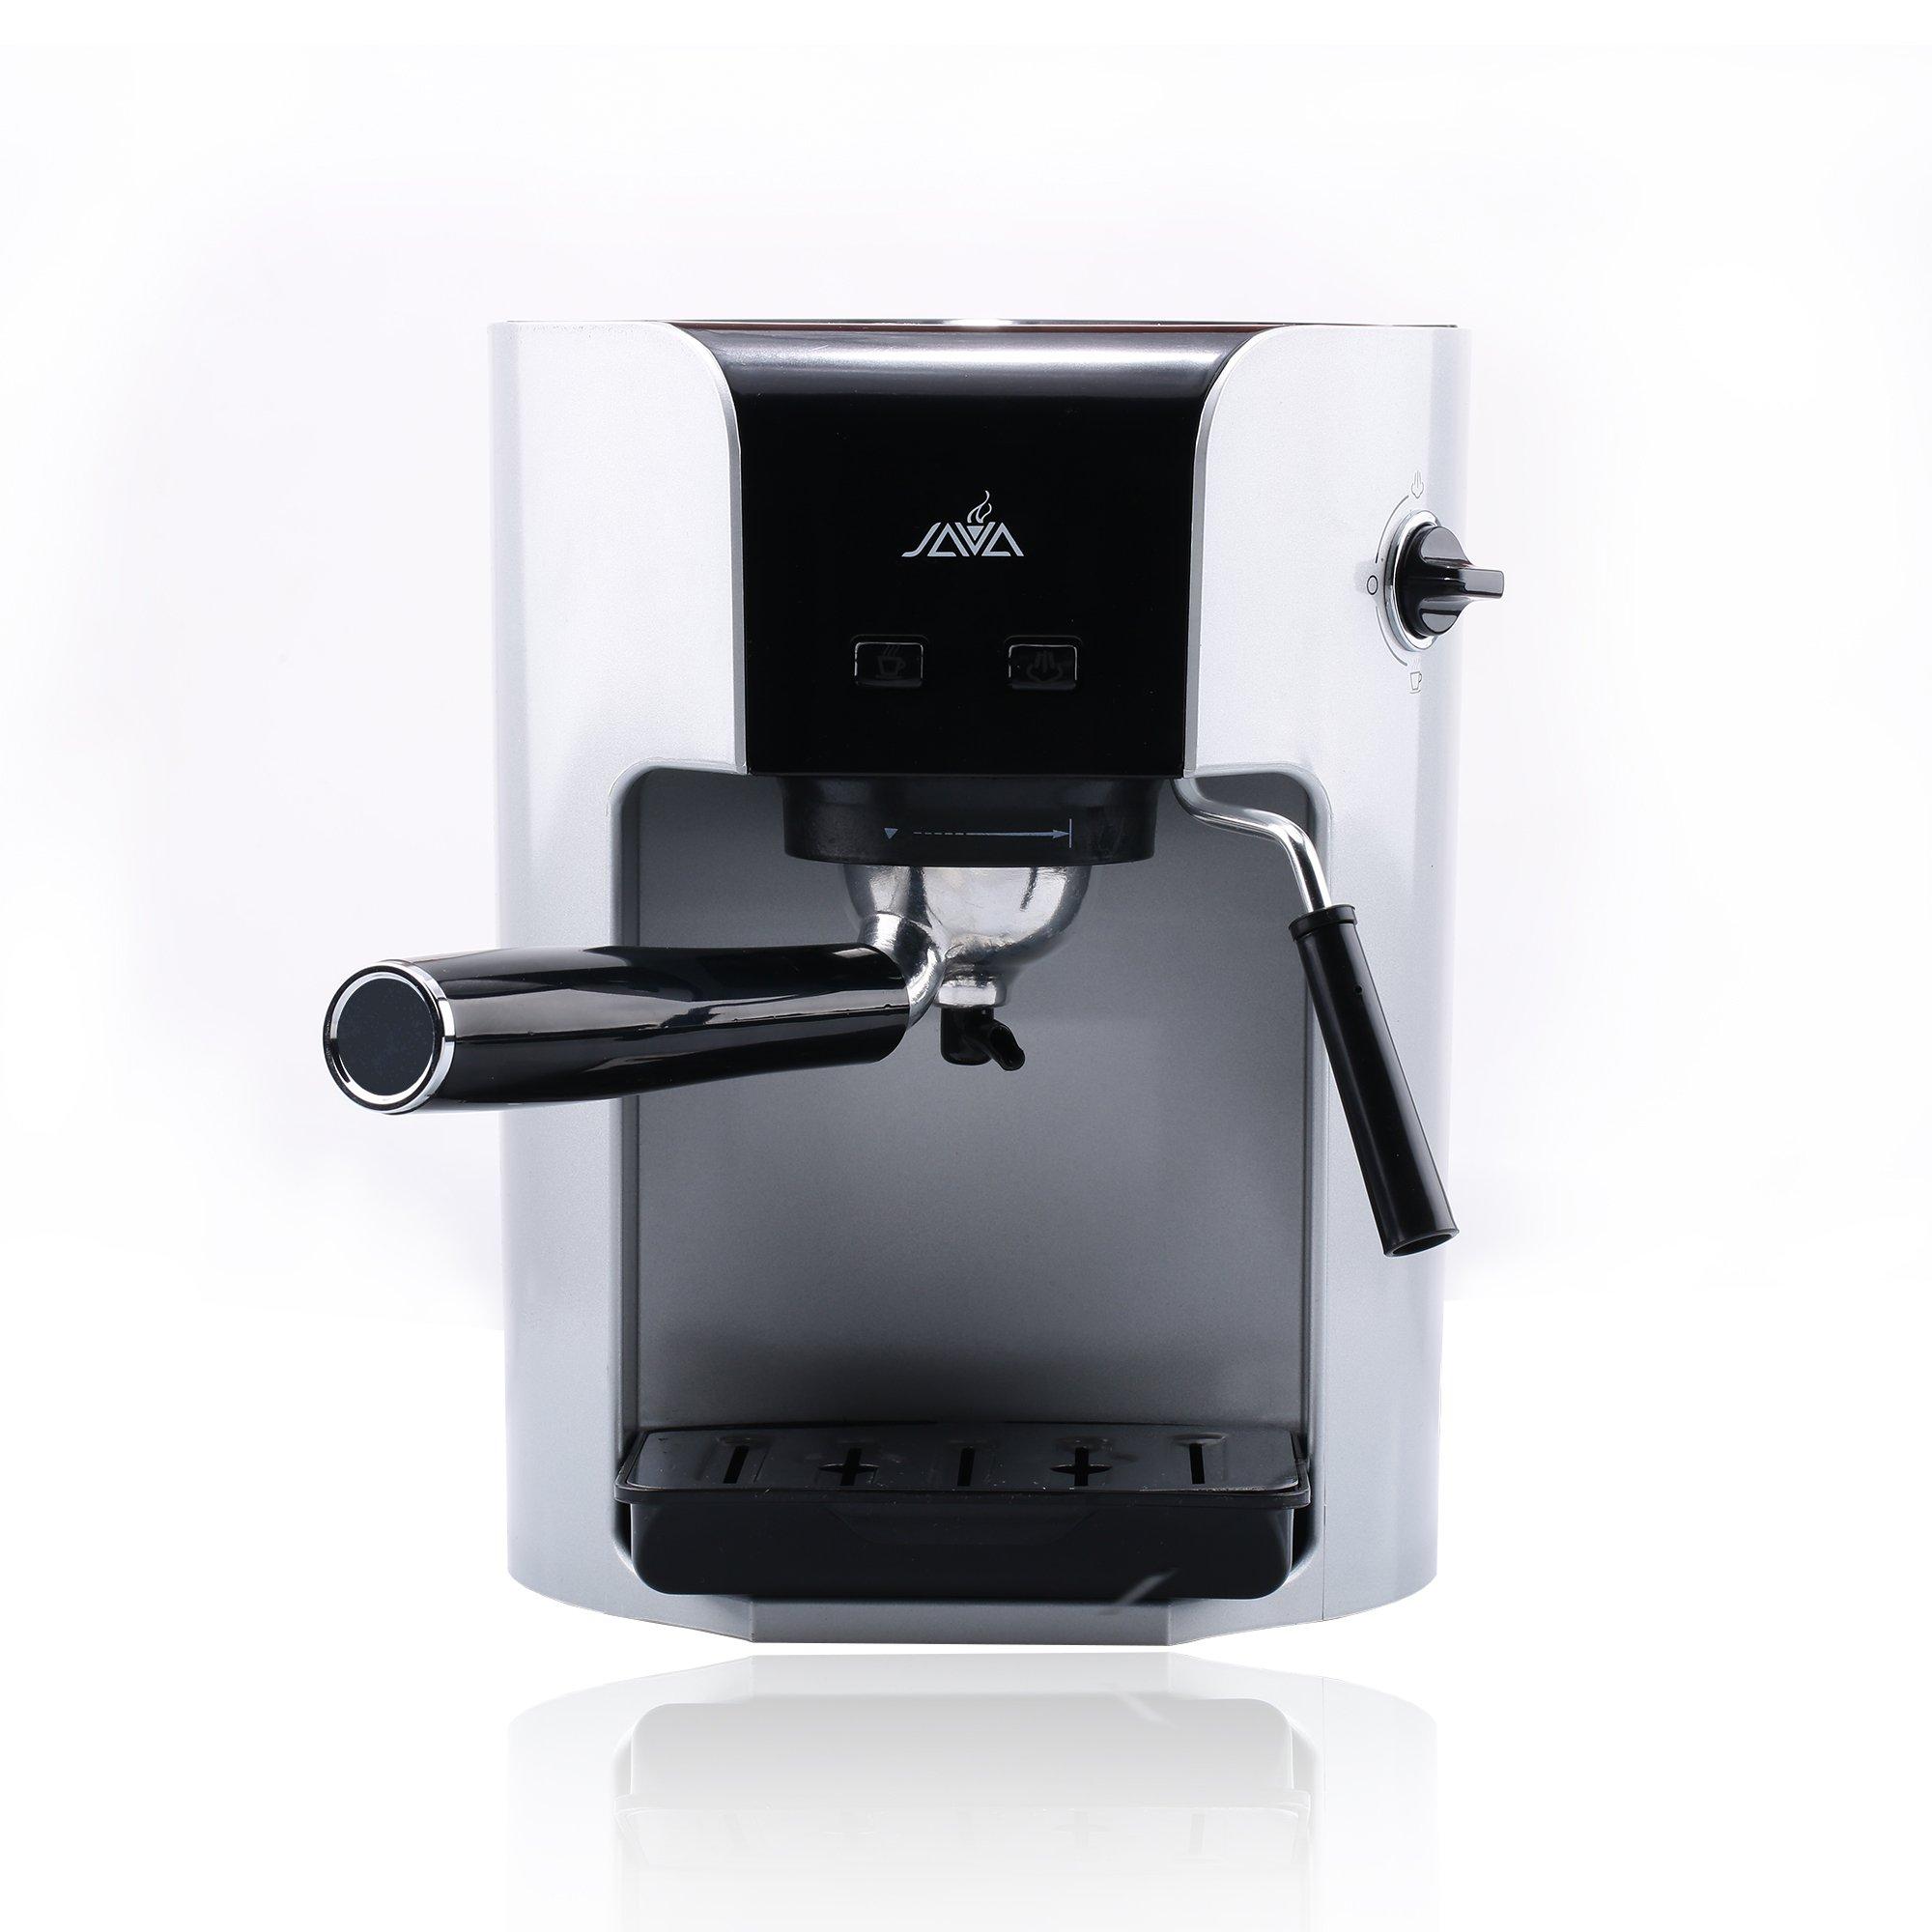 Java WSD18-050 Semi Auto ESPRESSO Coffee Maker With Milk Frother Coffee Pod Coffee Power Hard Capsule Drip Coffee Machine,Silver